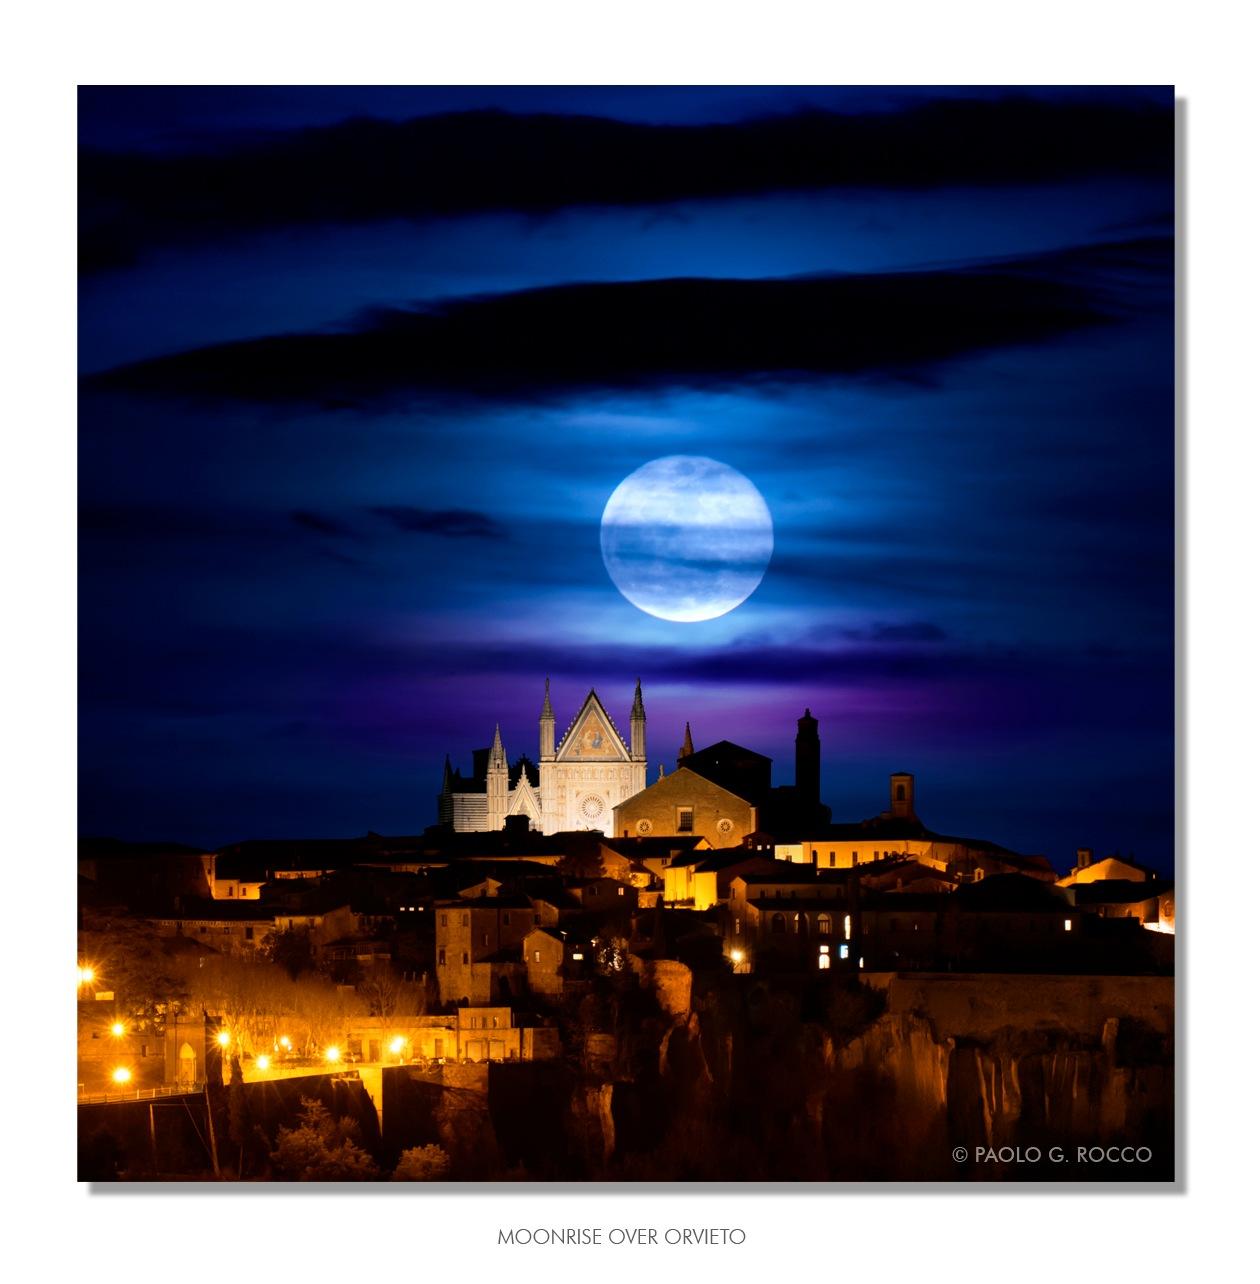 Moonrise over Orvieto by paologaetano